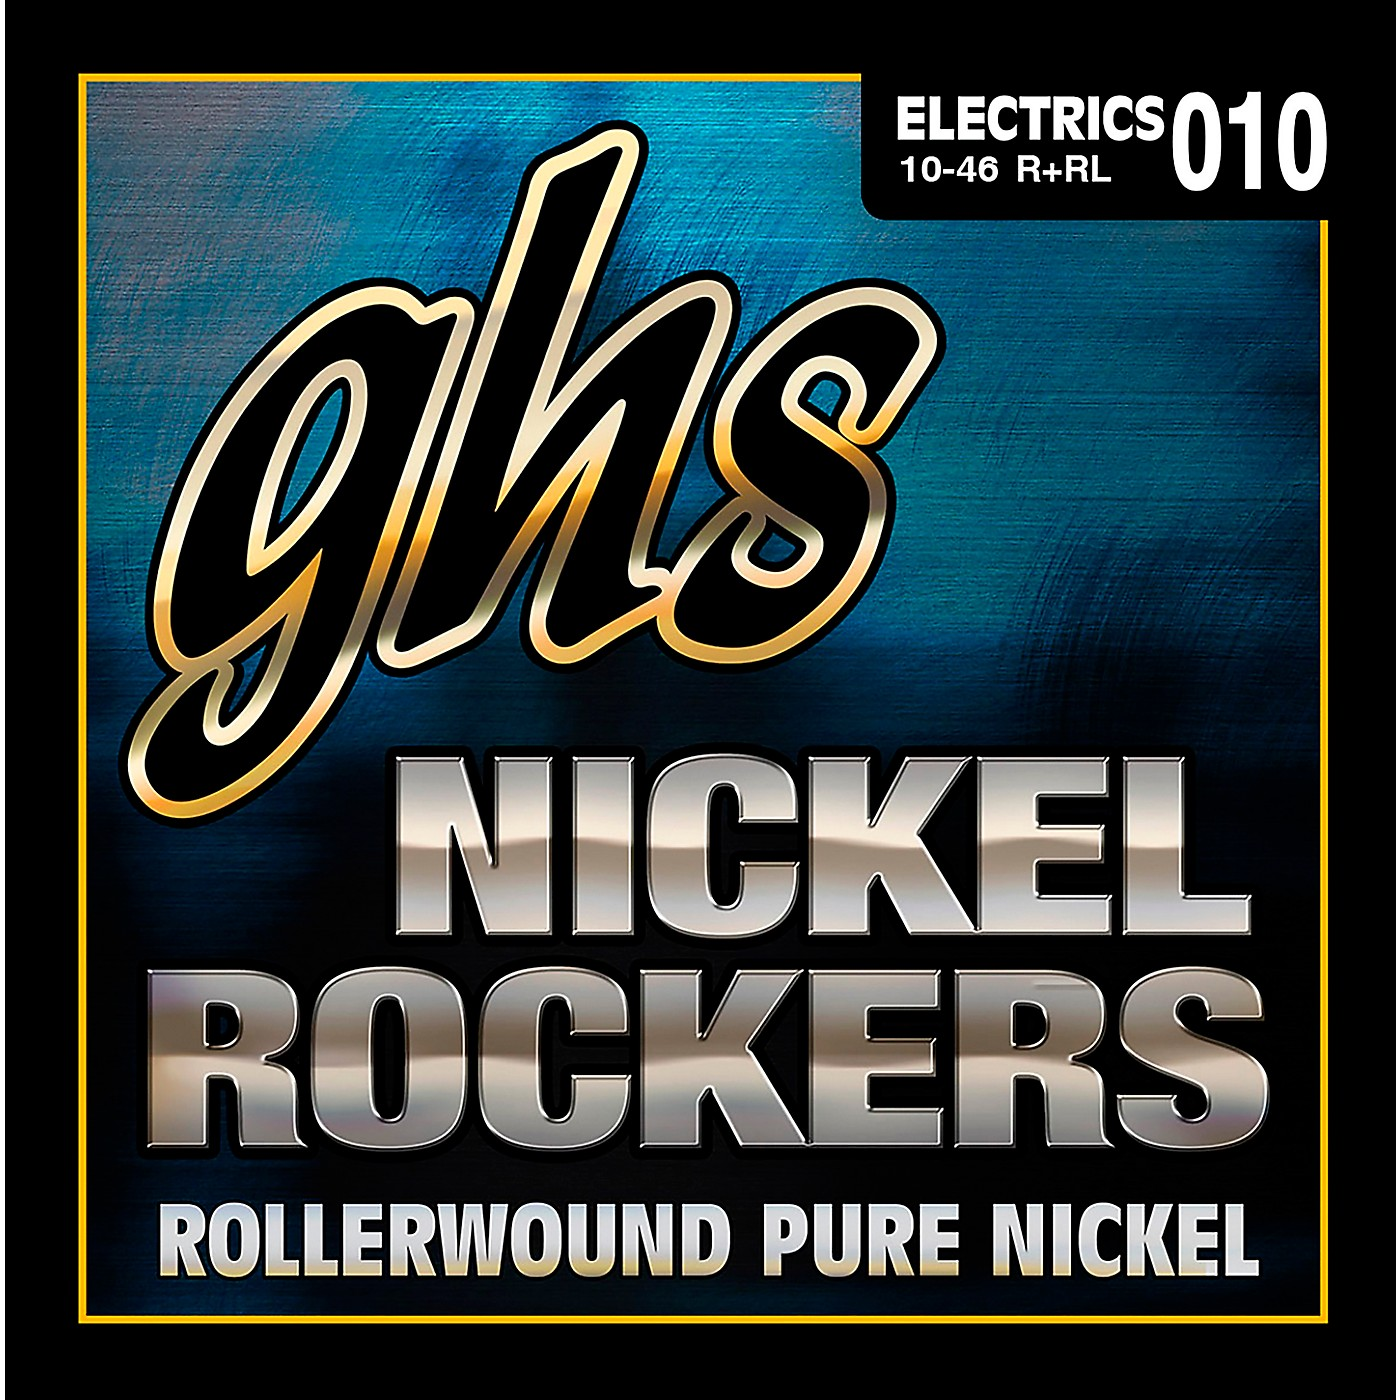 GHS R+RL Nickel Rockers Roundwound Light Electric Guitar Strings thumbnail